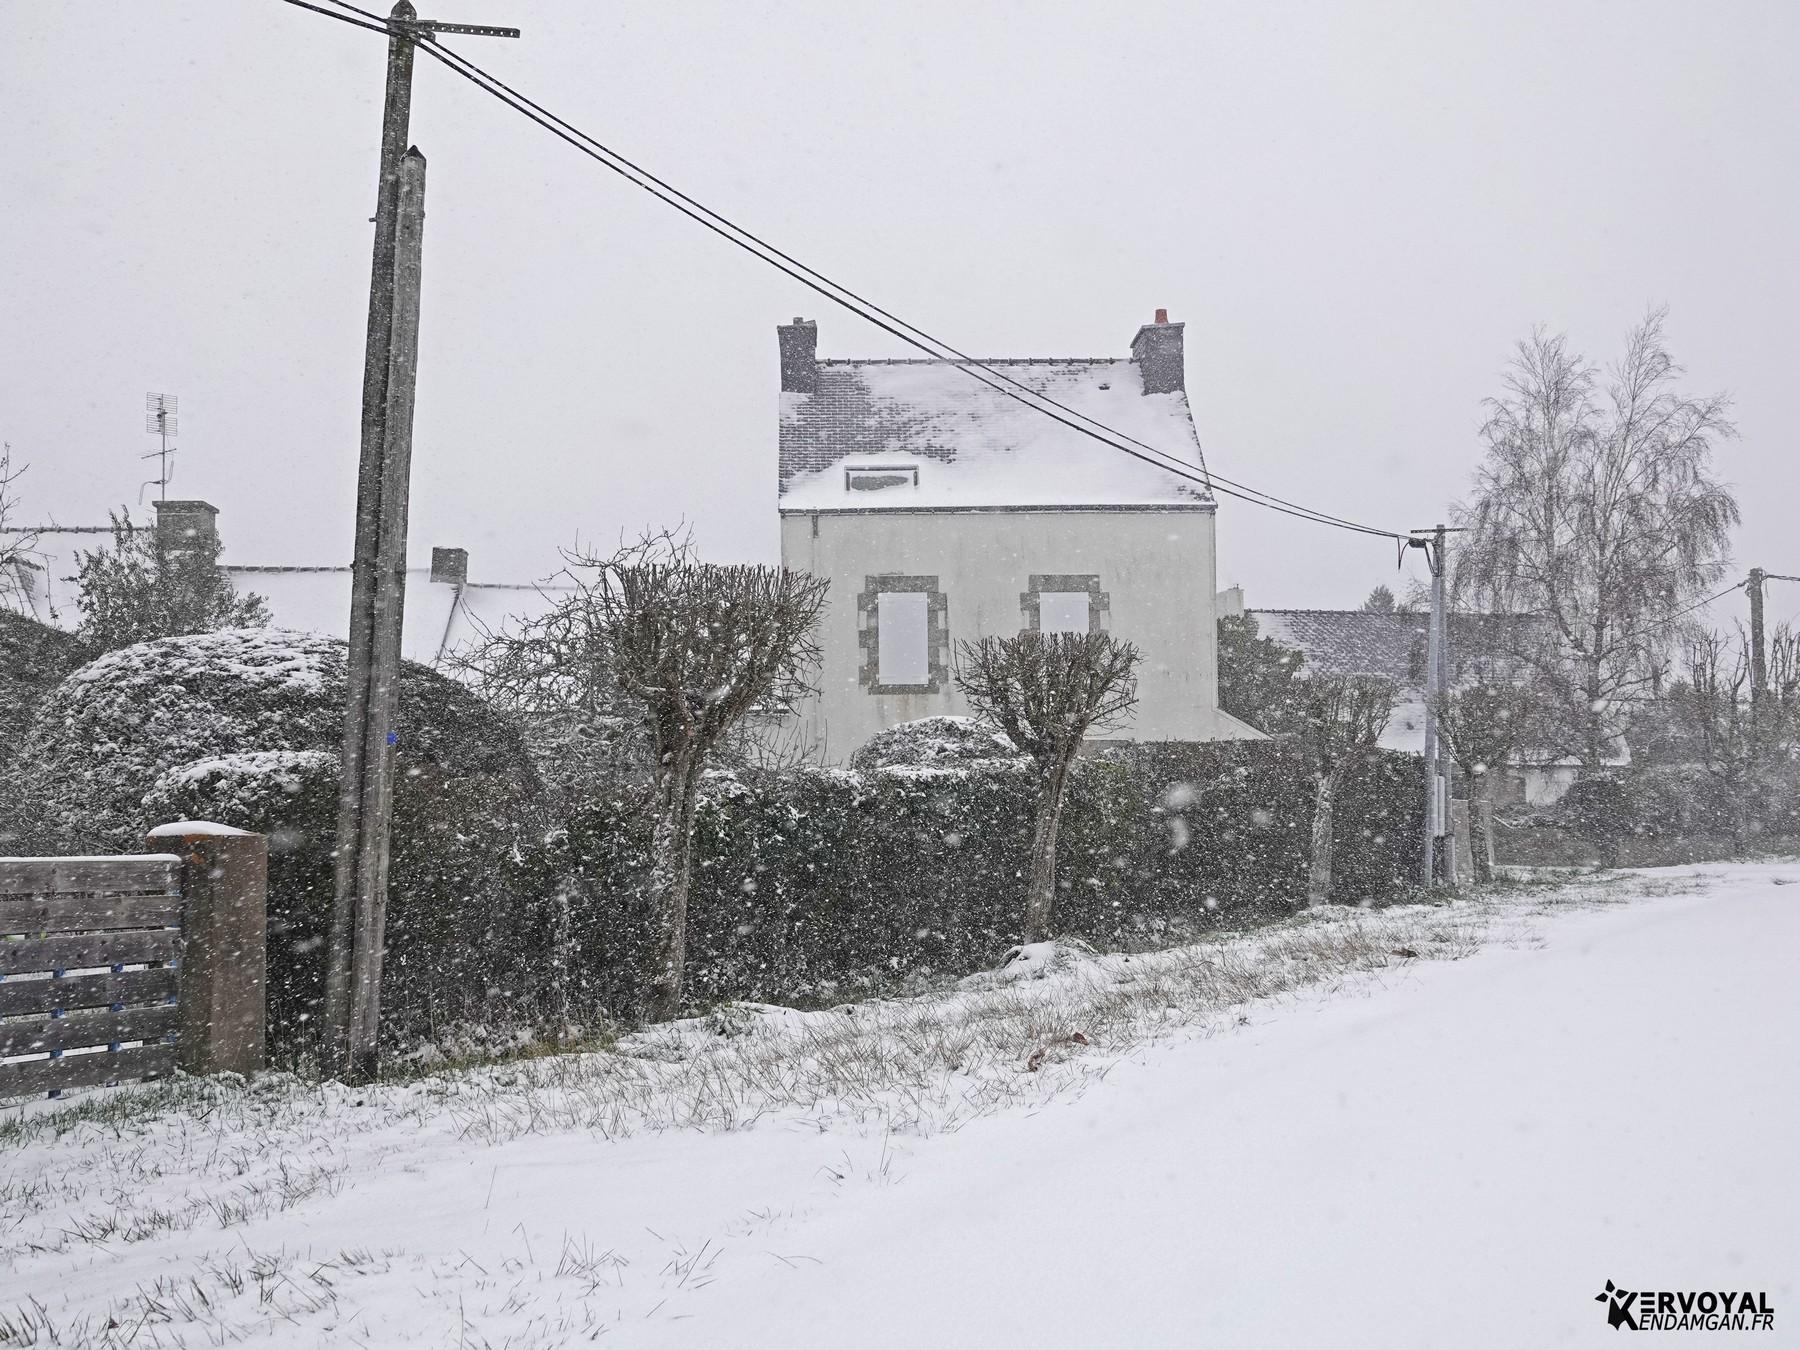 neige à kervoyal 11 février 2021 damgan morbihan (28)